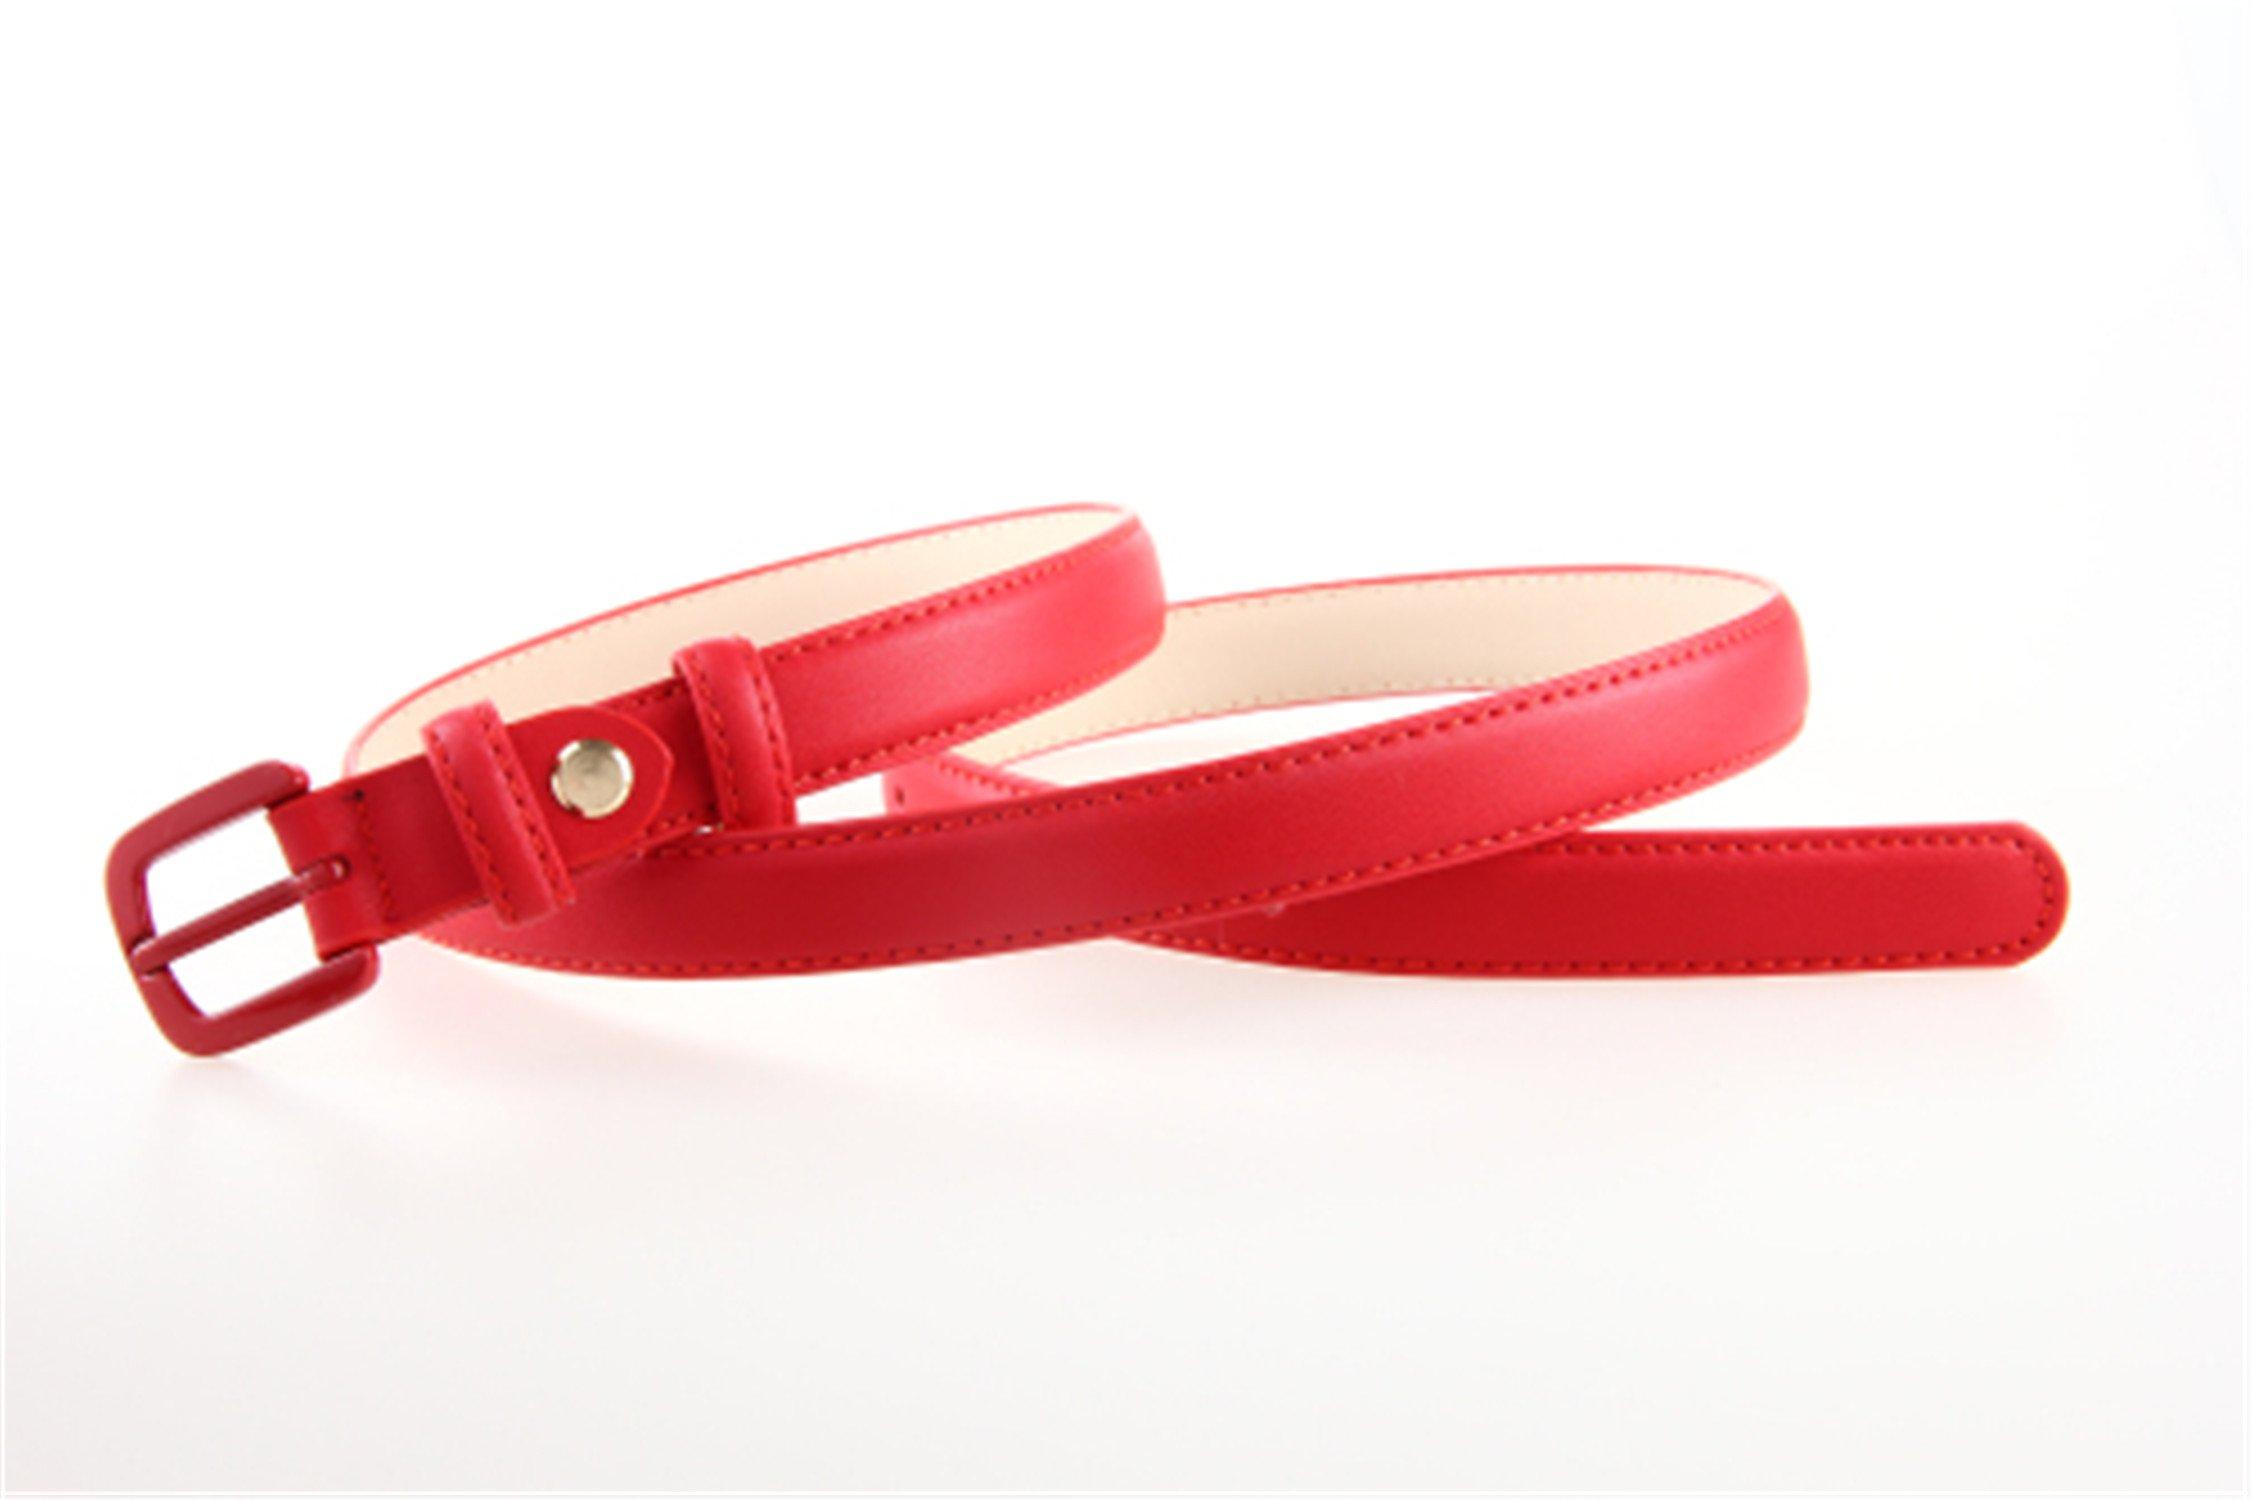 Beautifullight Hot Genuine Leather Femaleb Slim Belt Fashion Women Skinny Leather Waist Strap Blue Red Brown Black Leather Thin Belt